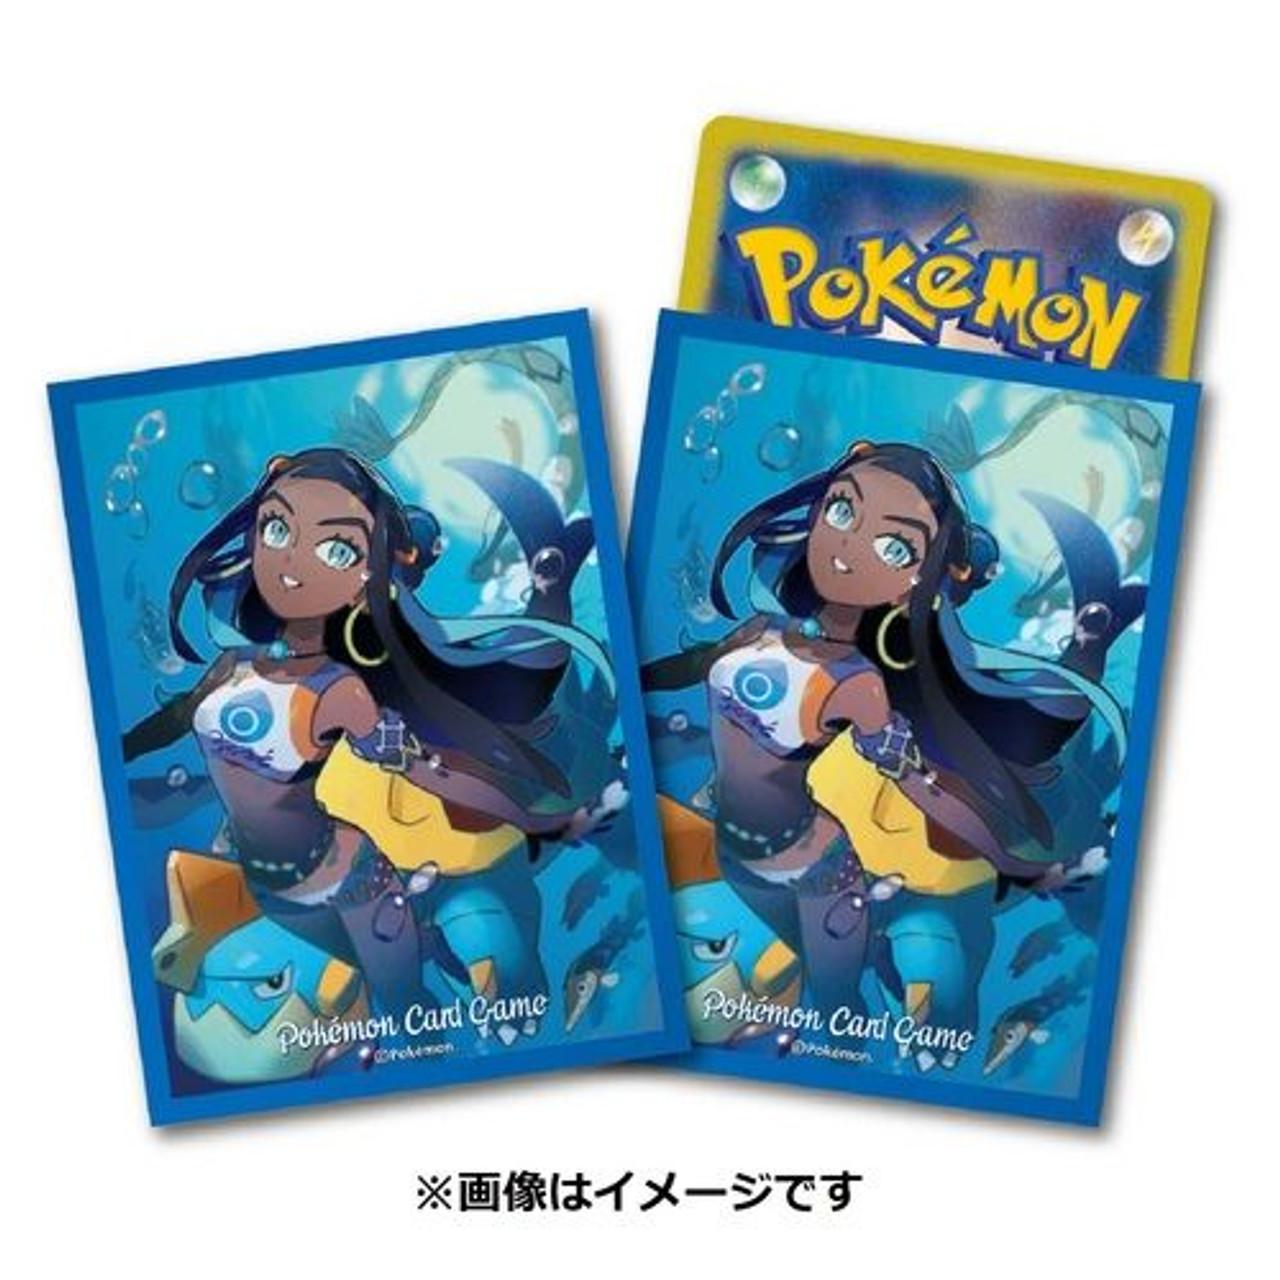 PSL Pokemon Card Game Sword /& Shield Shiny Star V Nessa set from Japan Sleeves